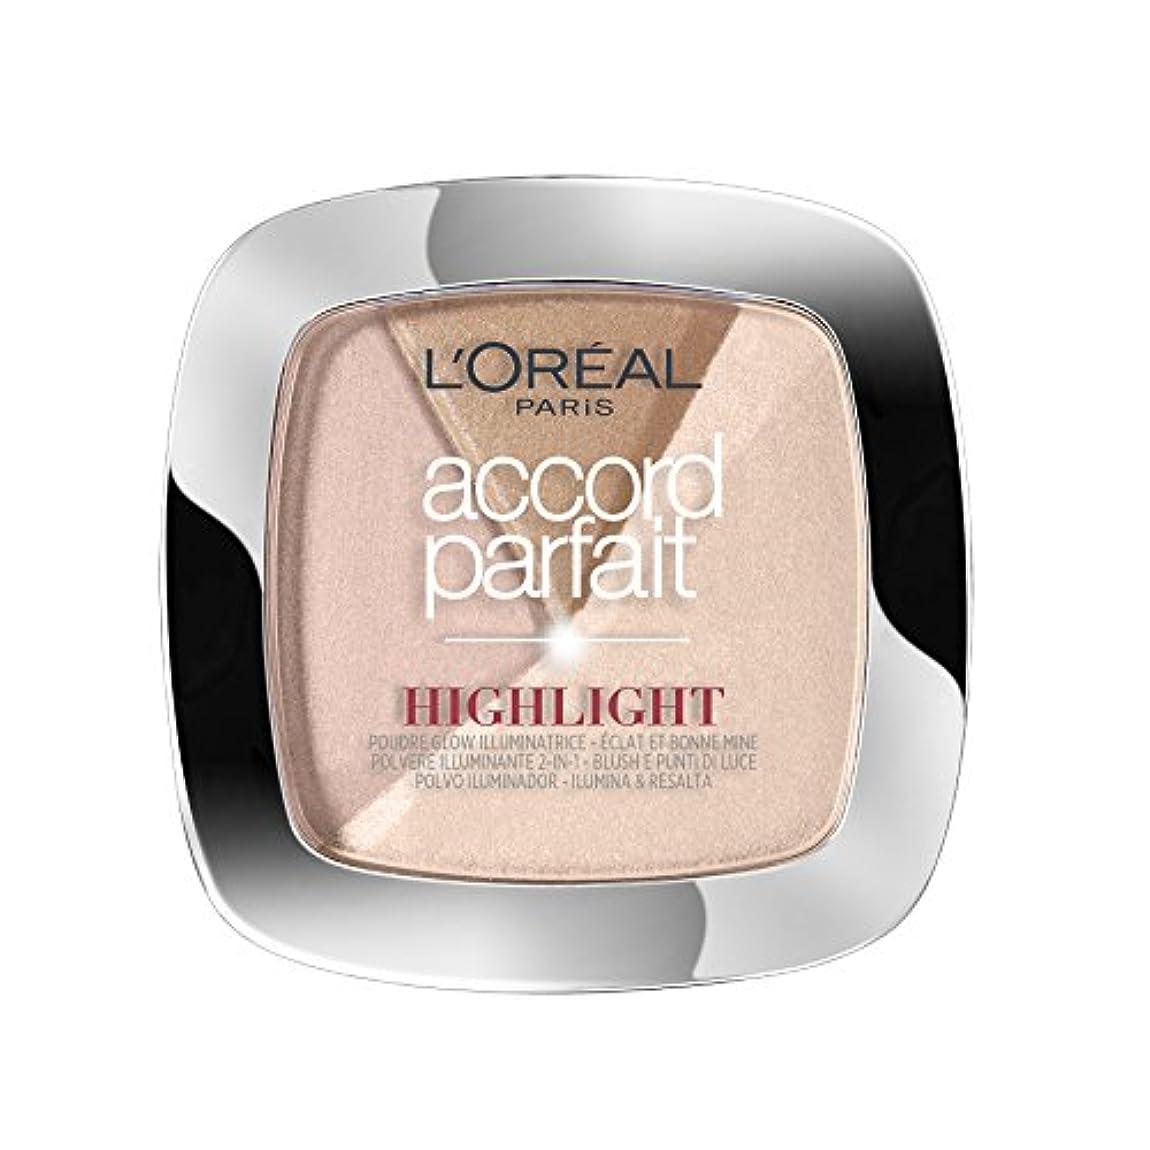 不適日の出固体L'OREAL PARIS Make up designer accord parfait highlight poudre 202.n éclat neutre rosé